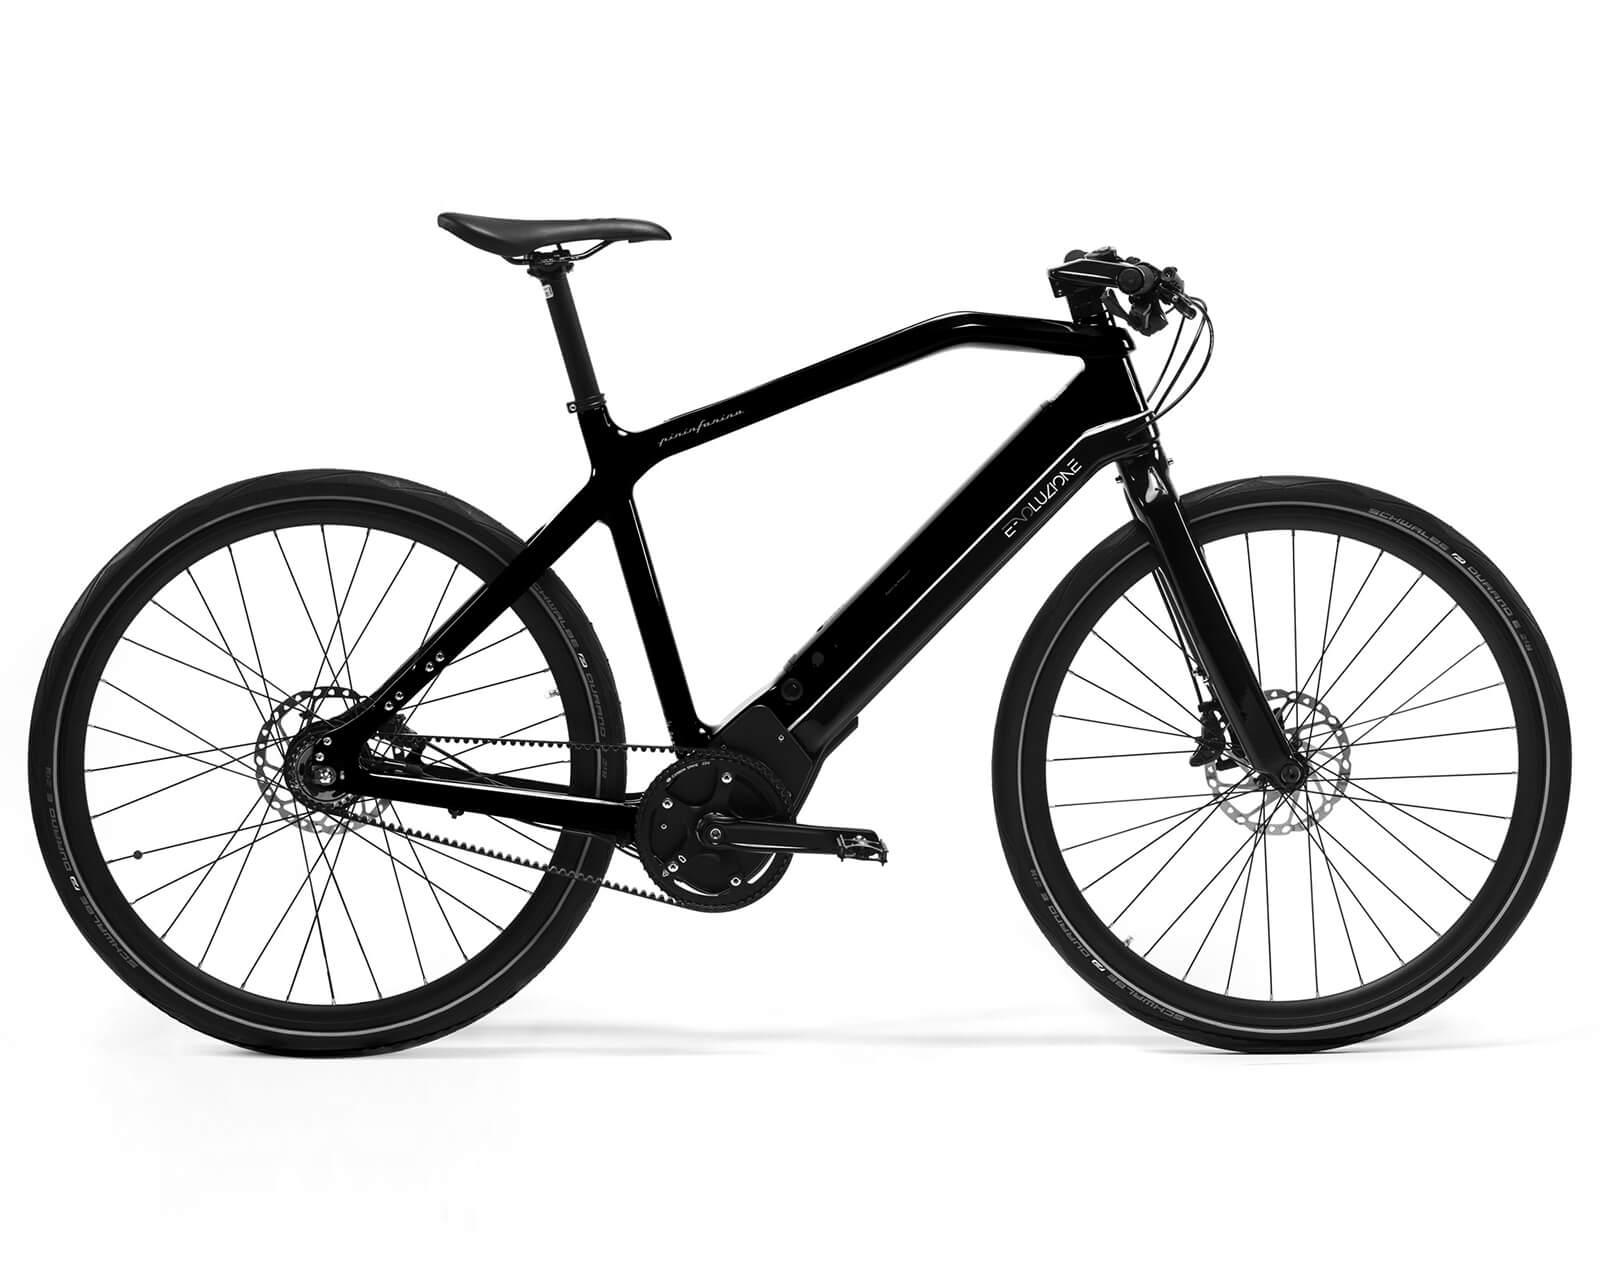 pininfarina matteo nanni bicicletta